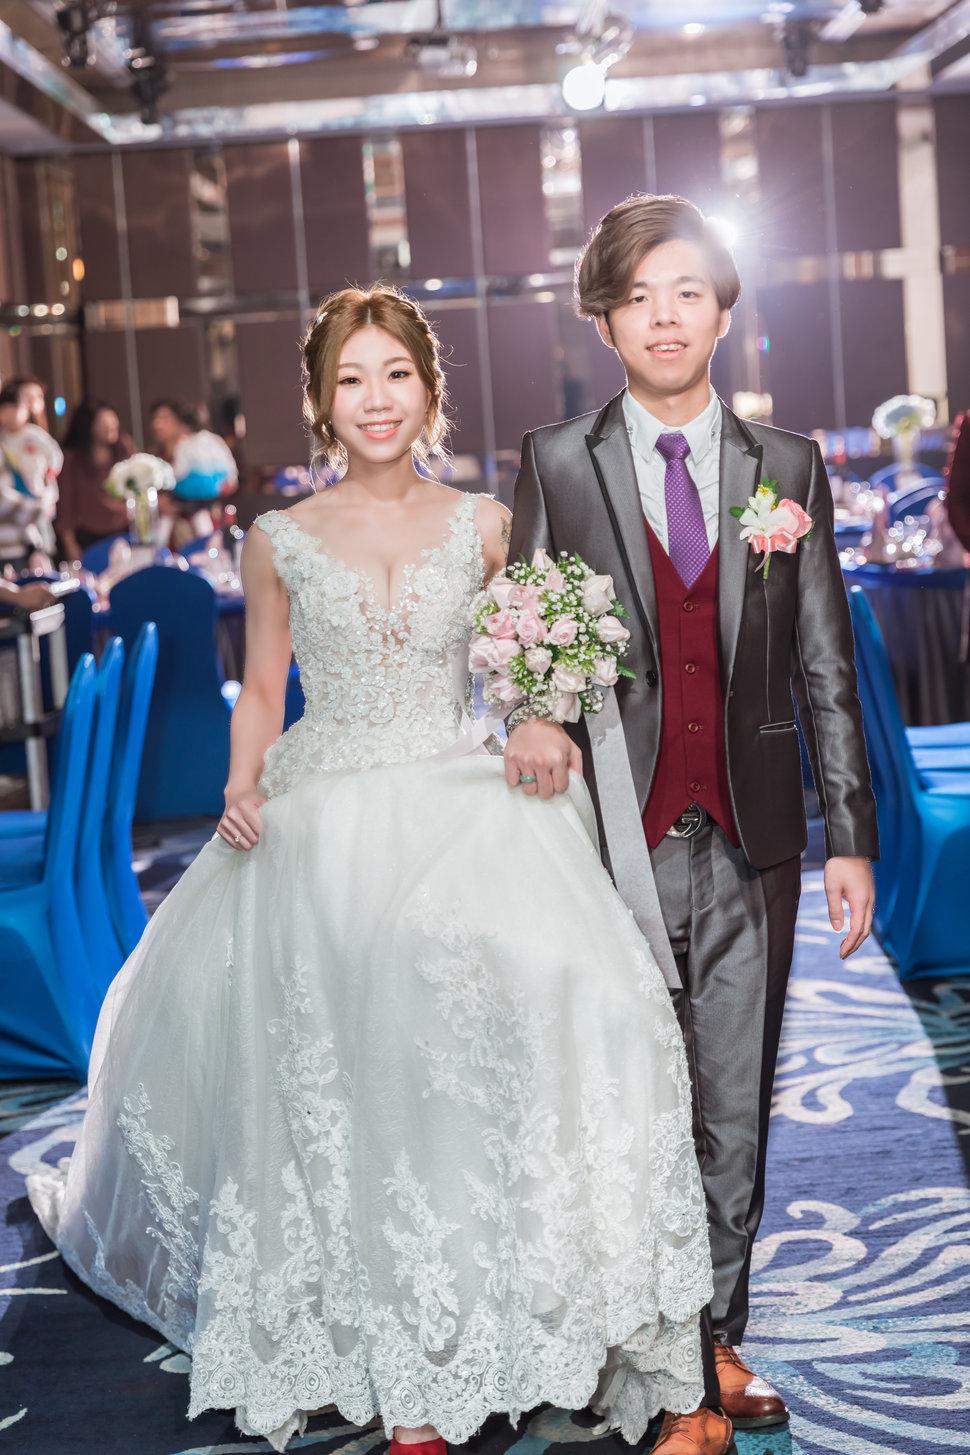 5D4_3545 - Promaker婚禮紀錄攝影團隊婚攝豪哥《結婚吧》